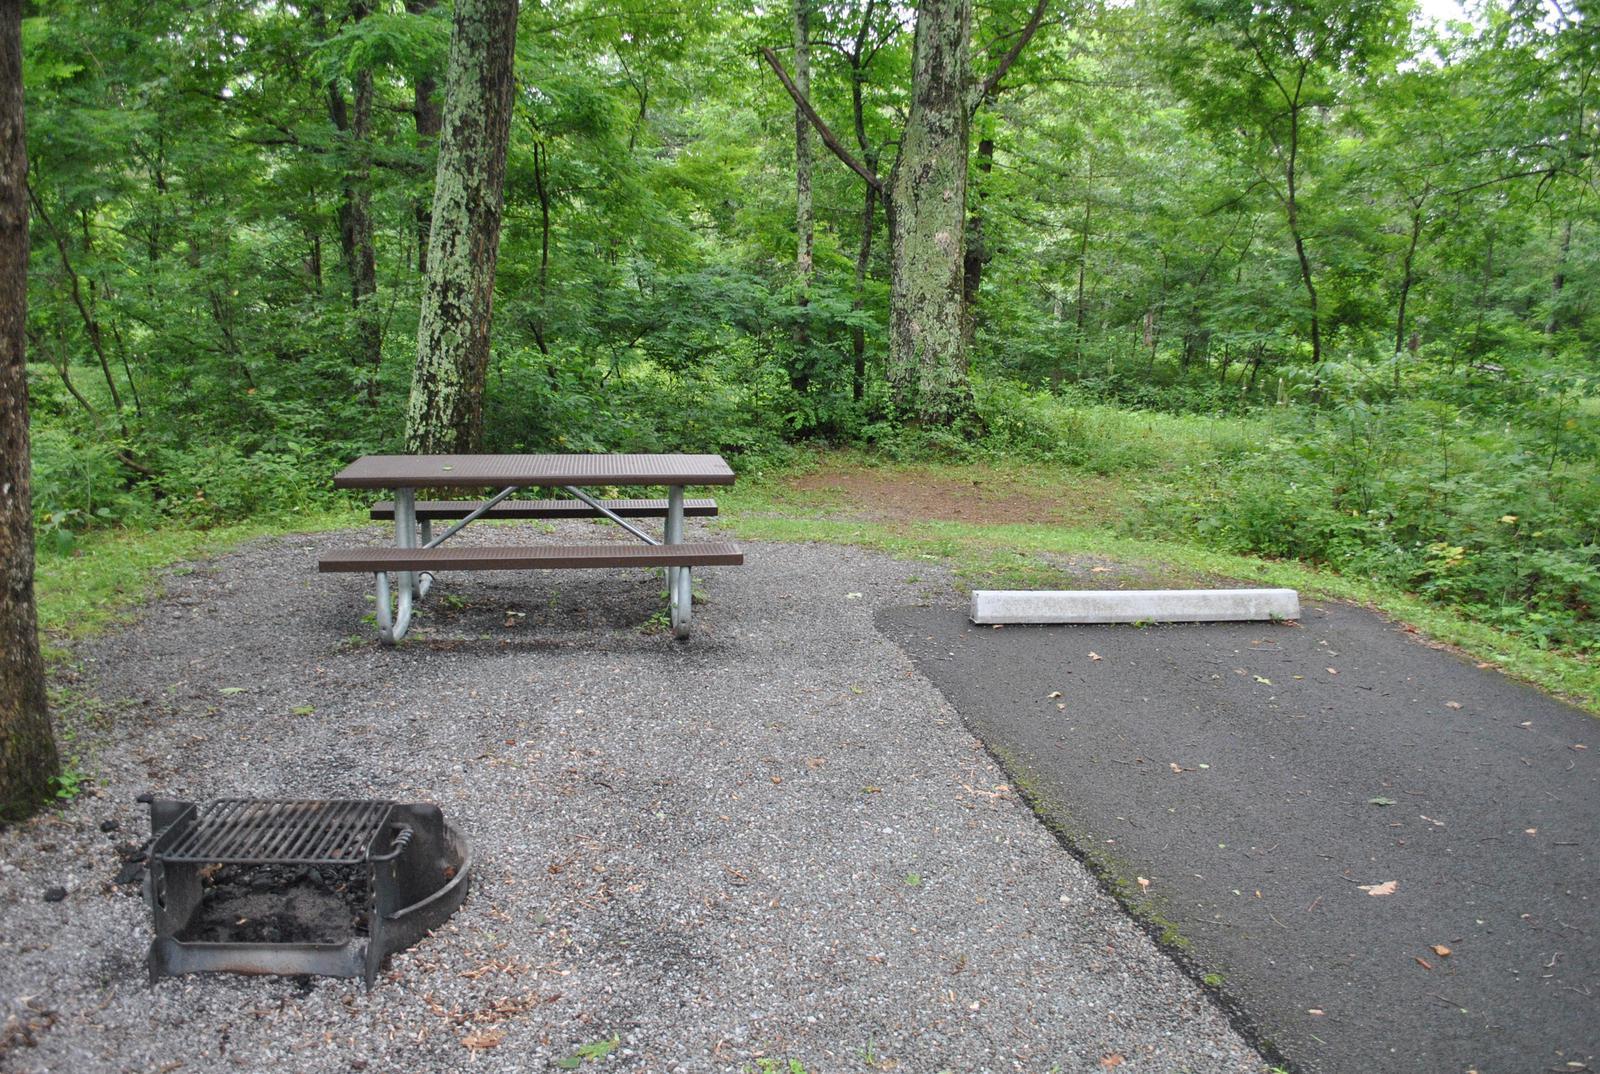 Mathews Arm Campground - Site C151